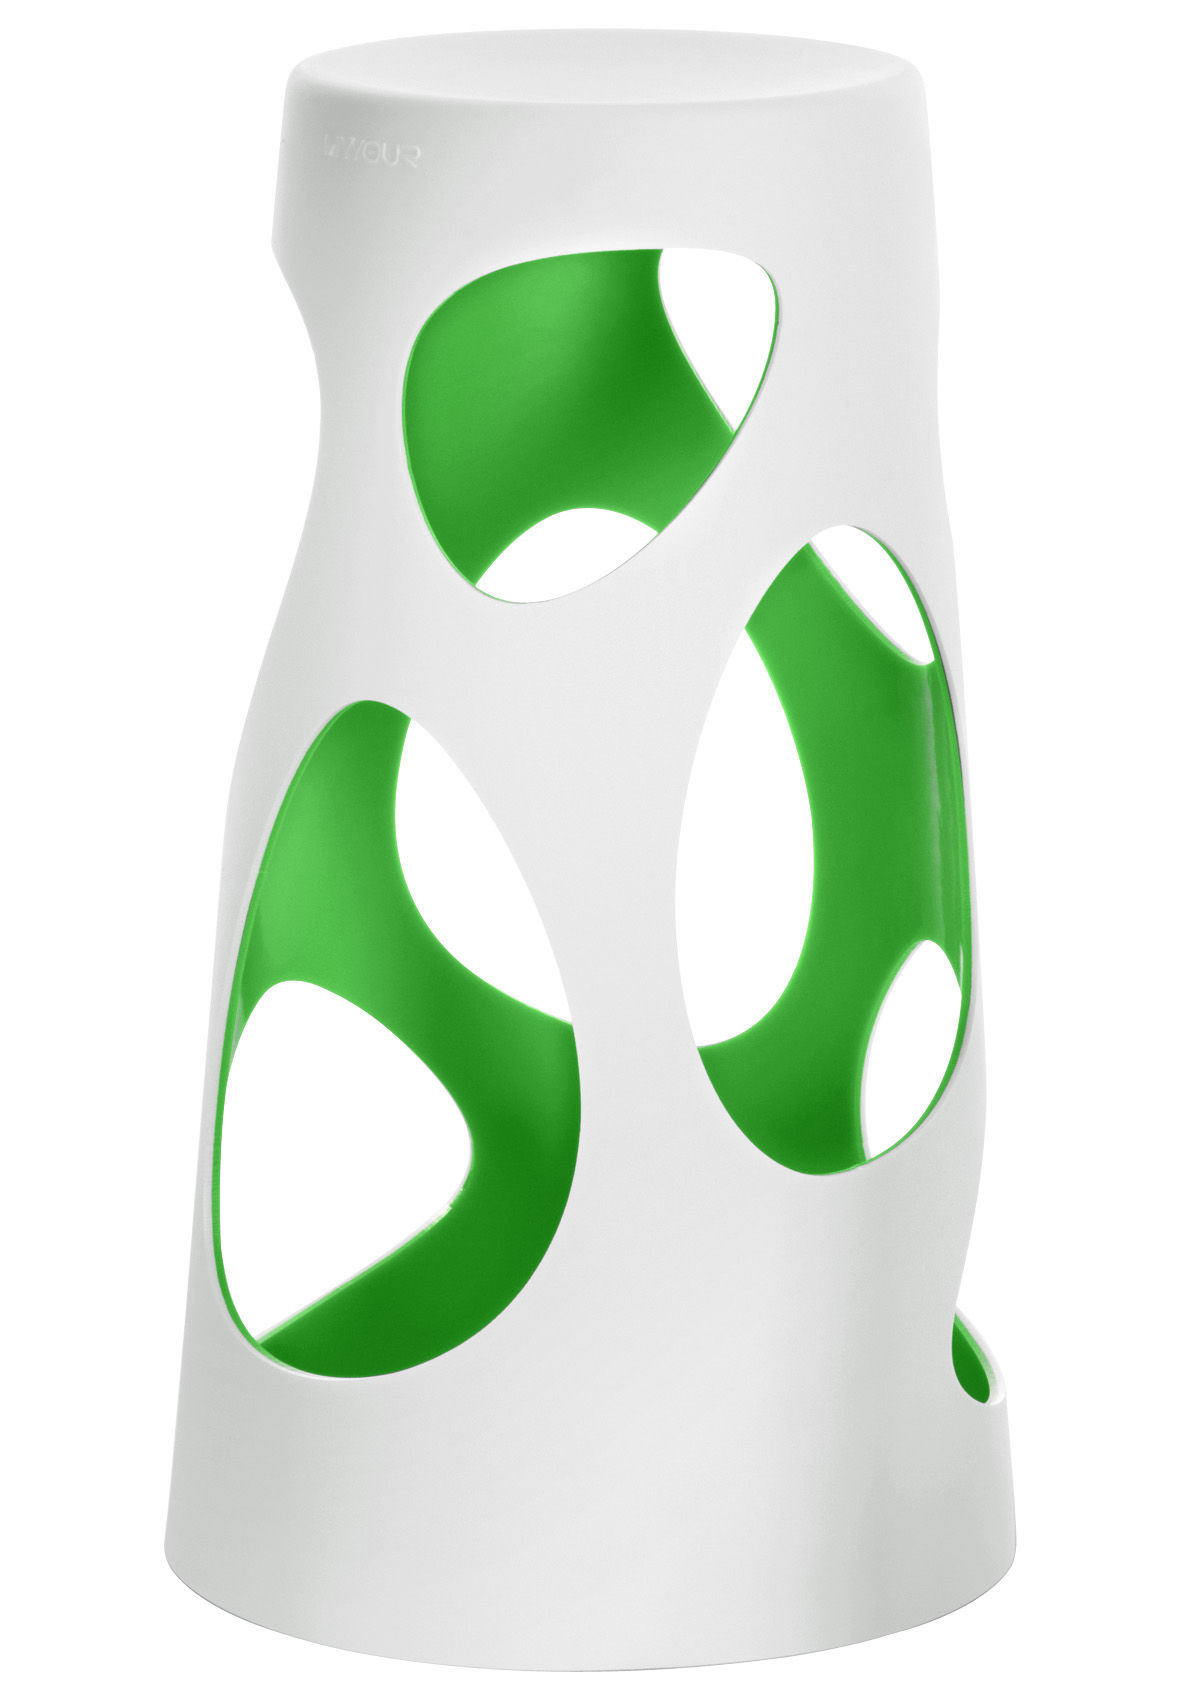 Arredamento - Sgabelli da bar  - Sgabello bar Liberty - H 74 cm di MyYour - Esterno bianco / Interno verde - Poleasy